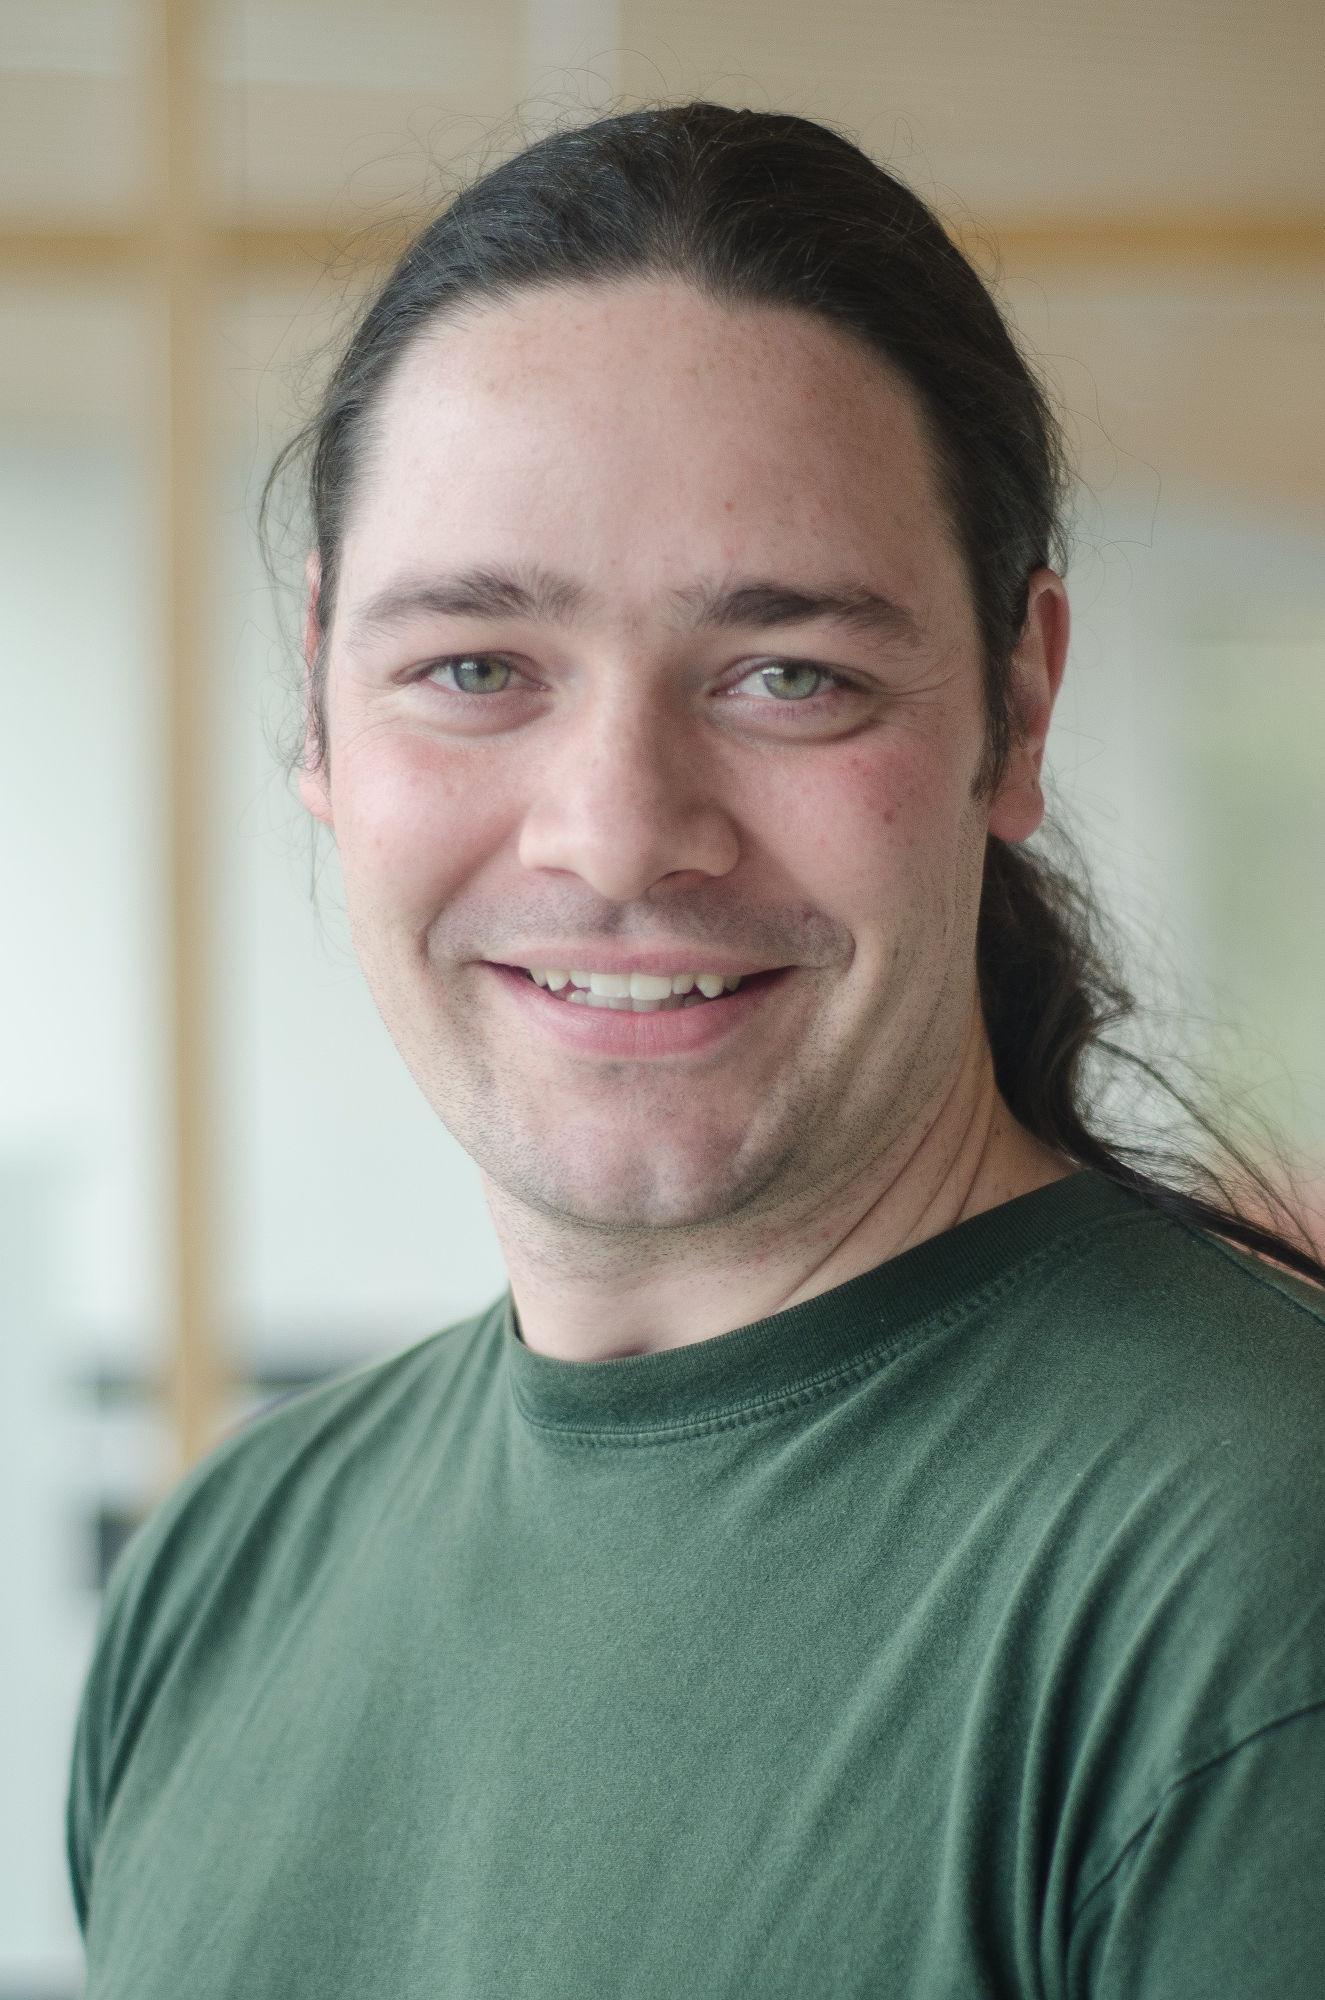 Dr. Glenn Van Wallendael